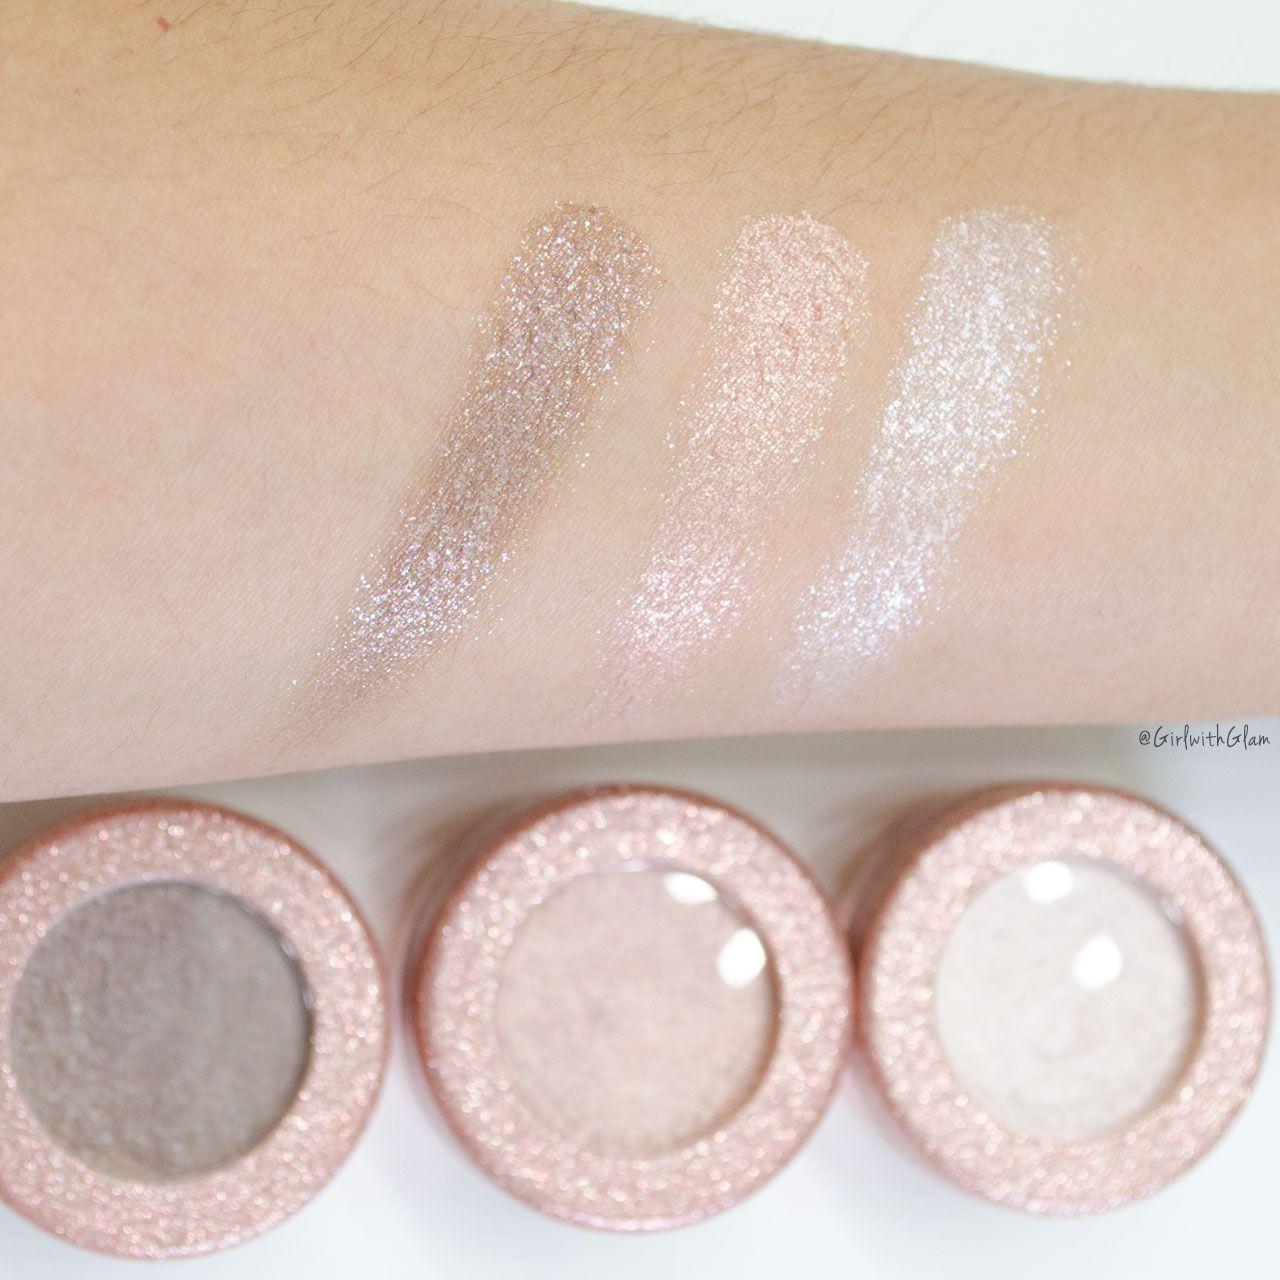 Physicians Formula Eye Enhancing Extreme Shimmer Gel Cream Shadow